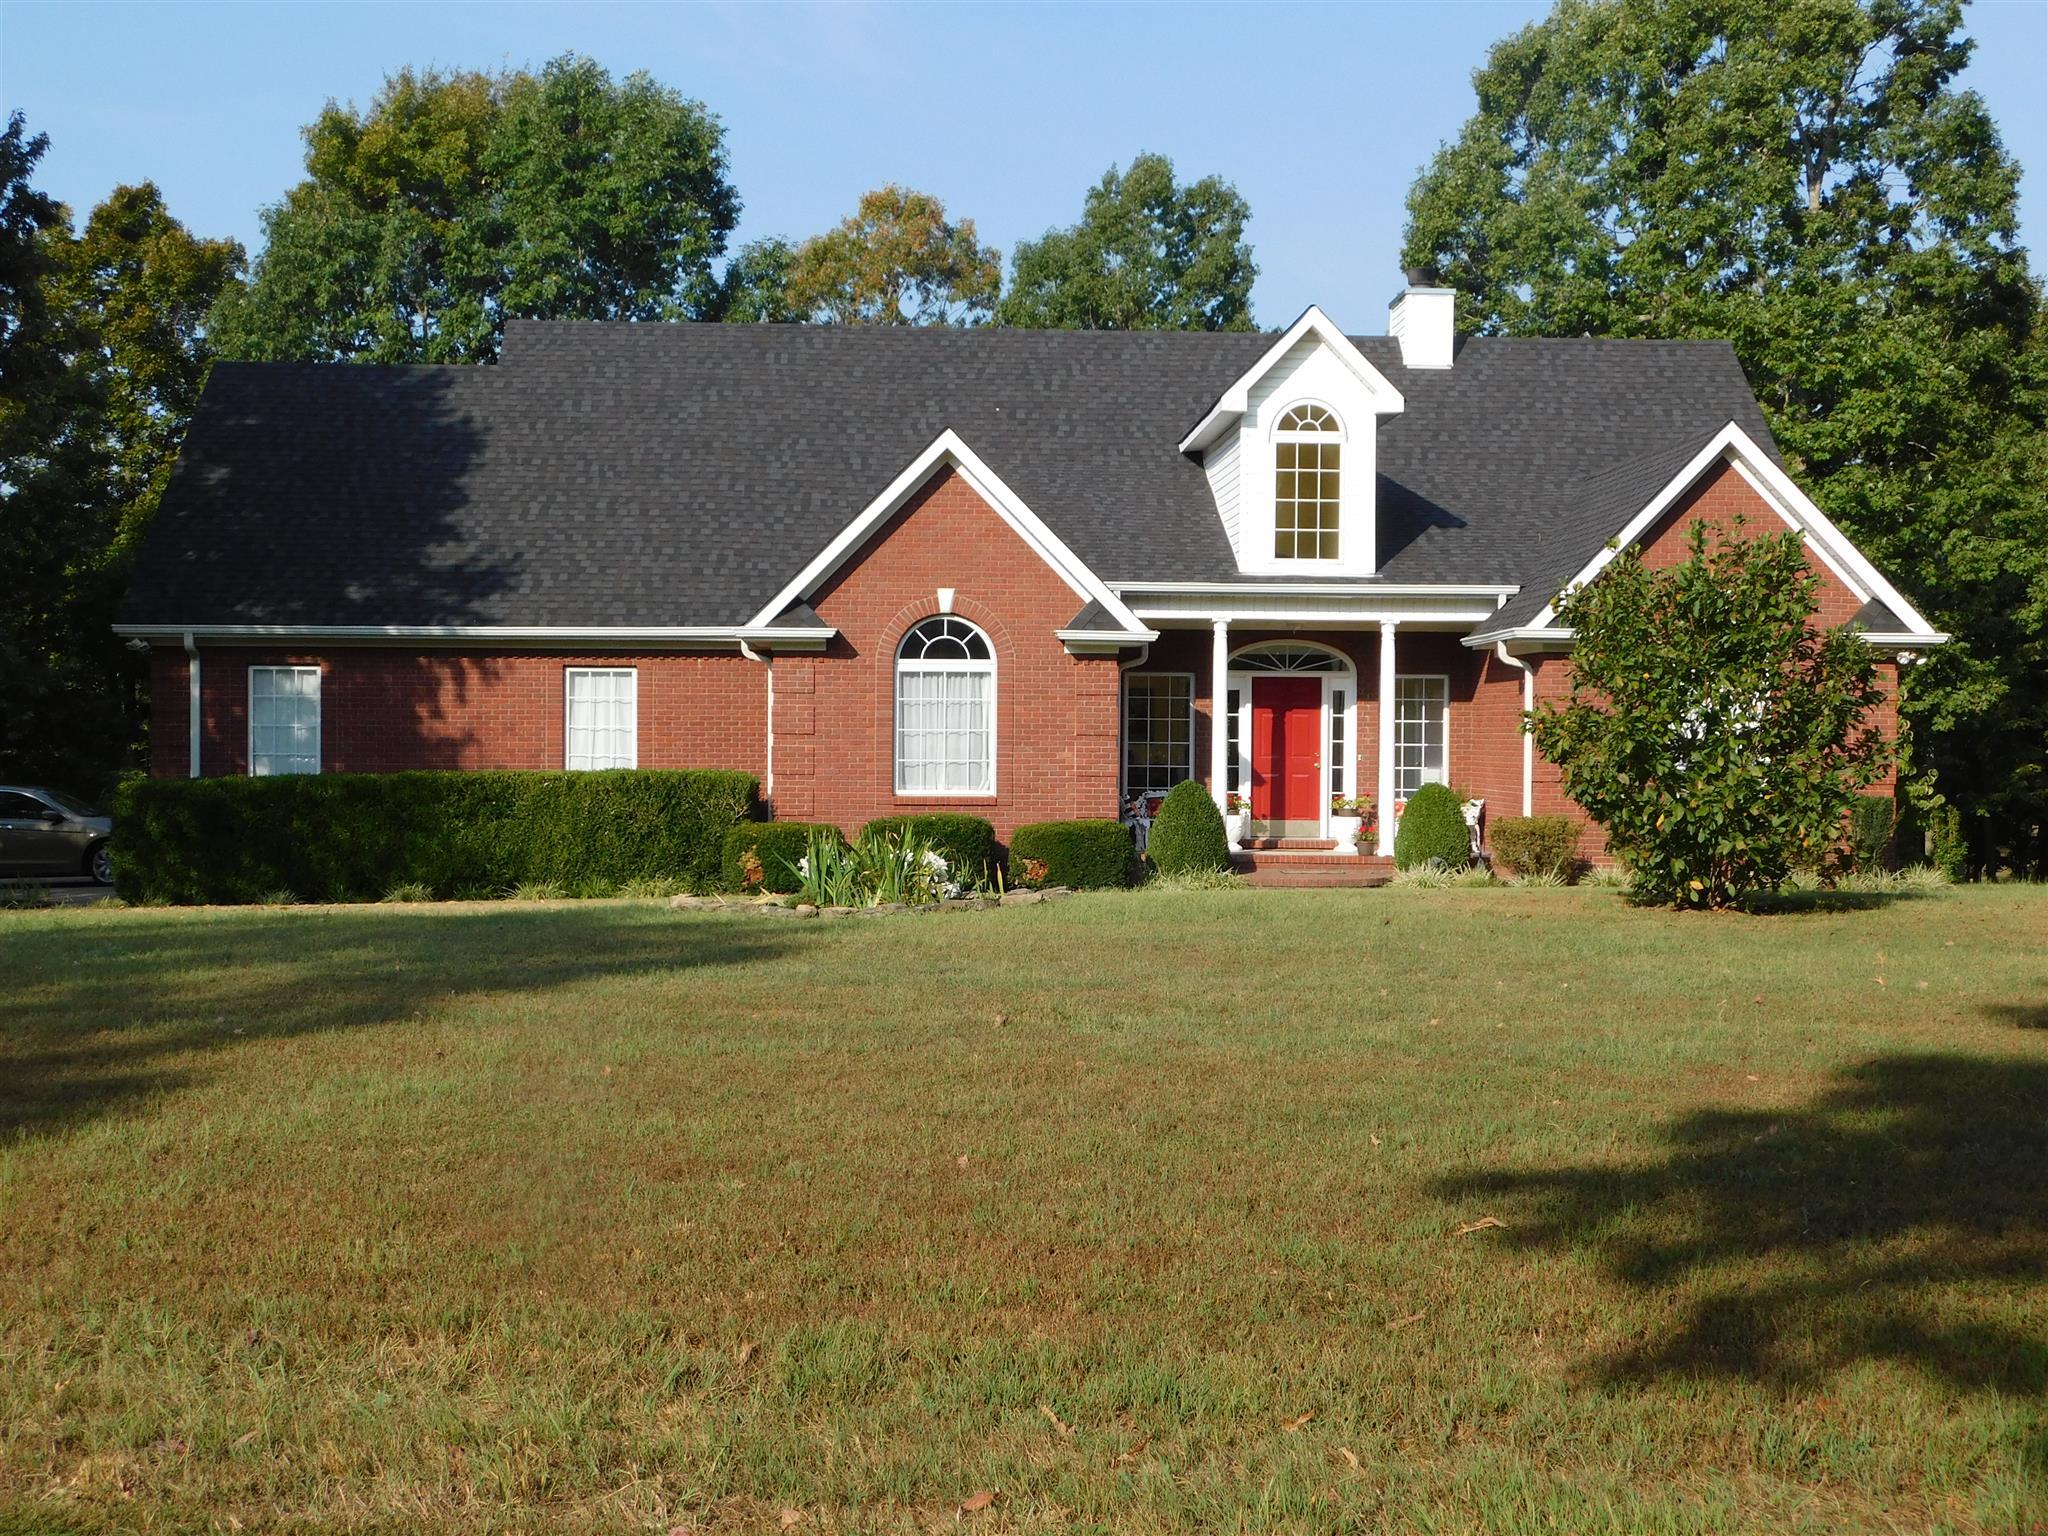 104 Timberwood Ln, Hampshire, TN 38461 - Hampshire, TN real estate listing